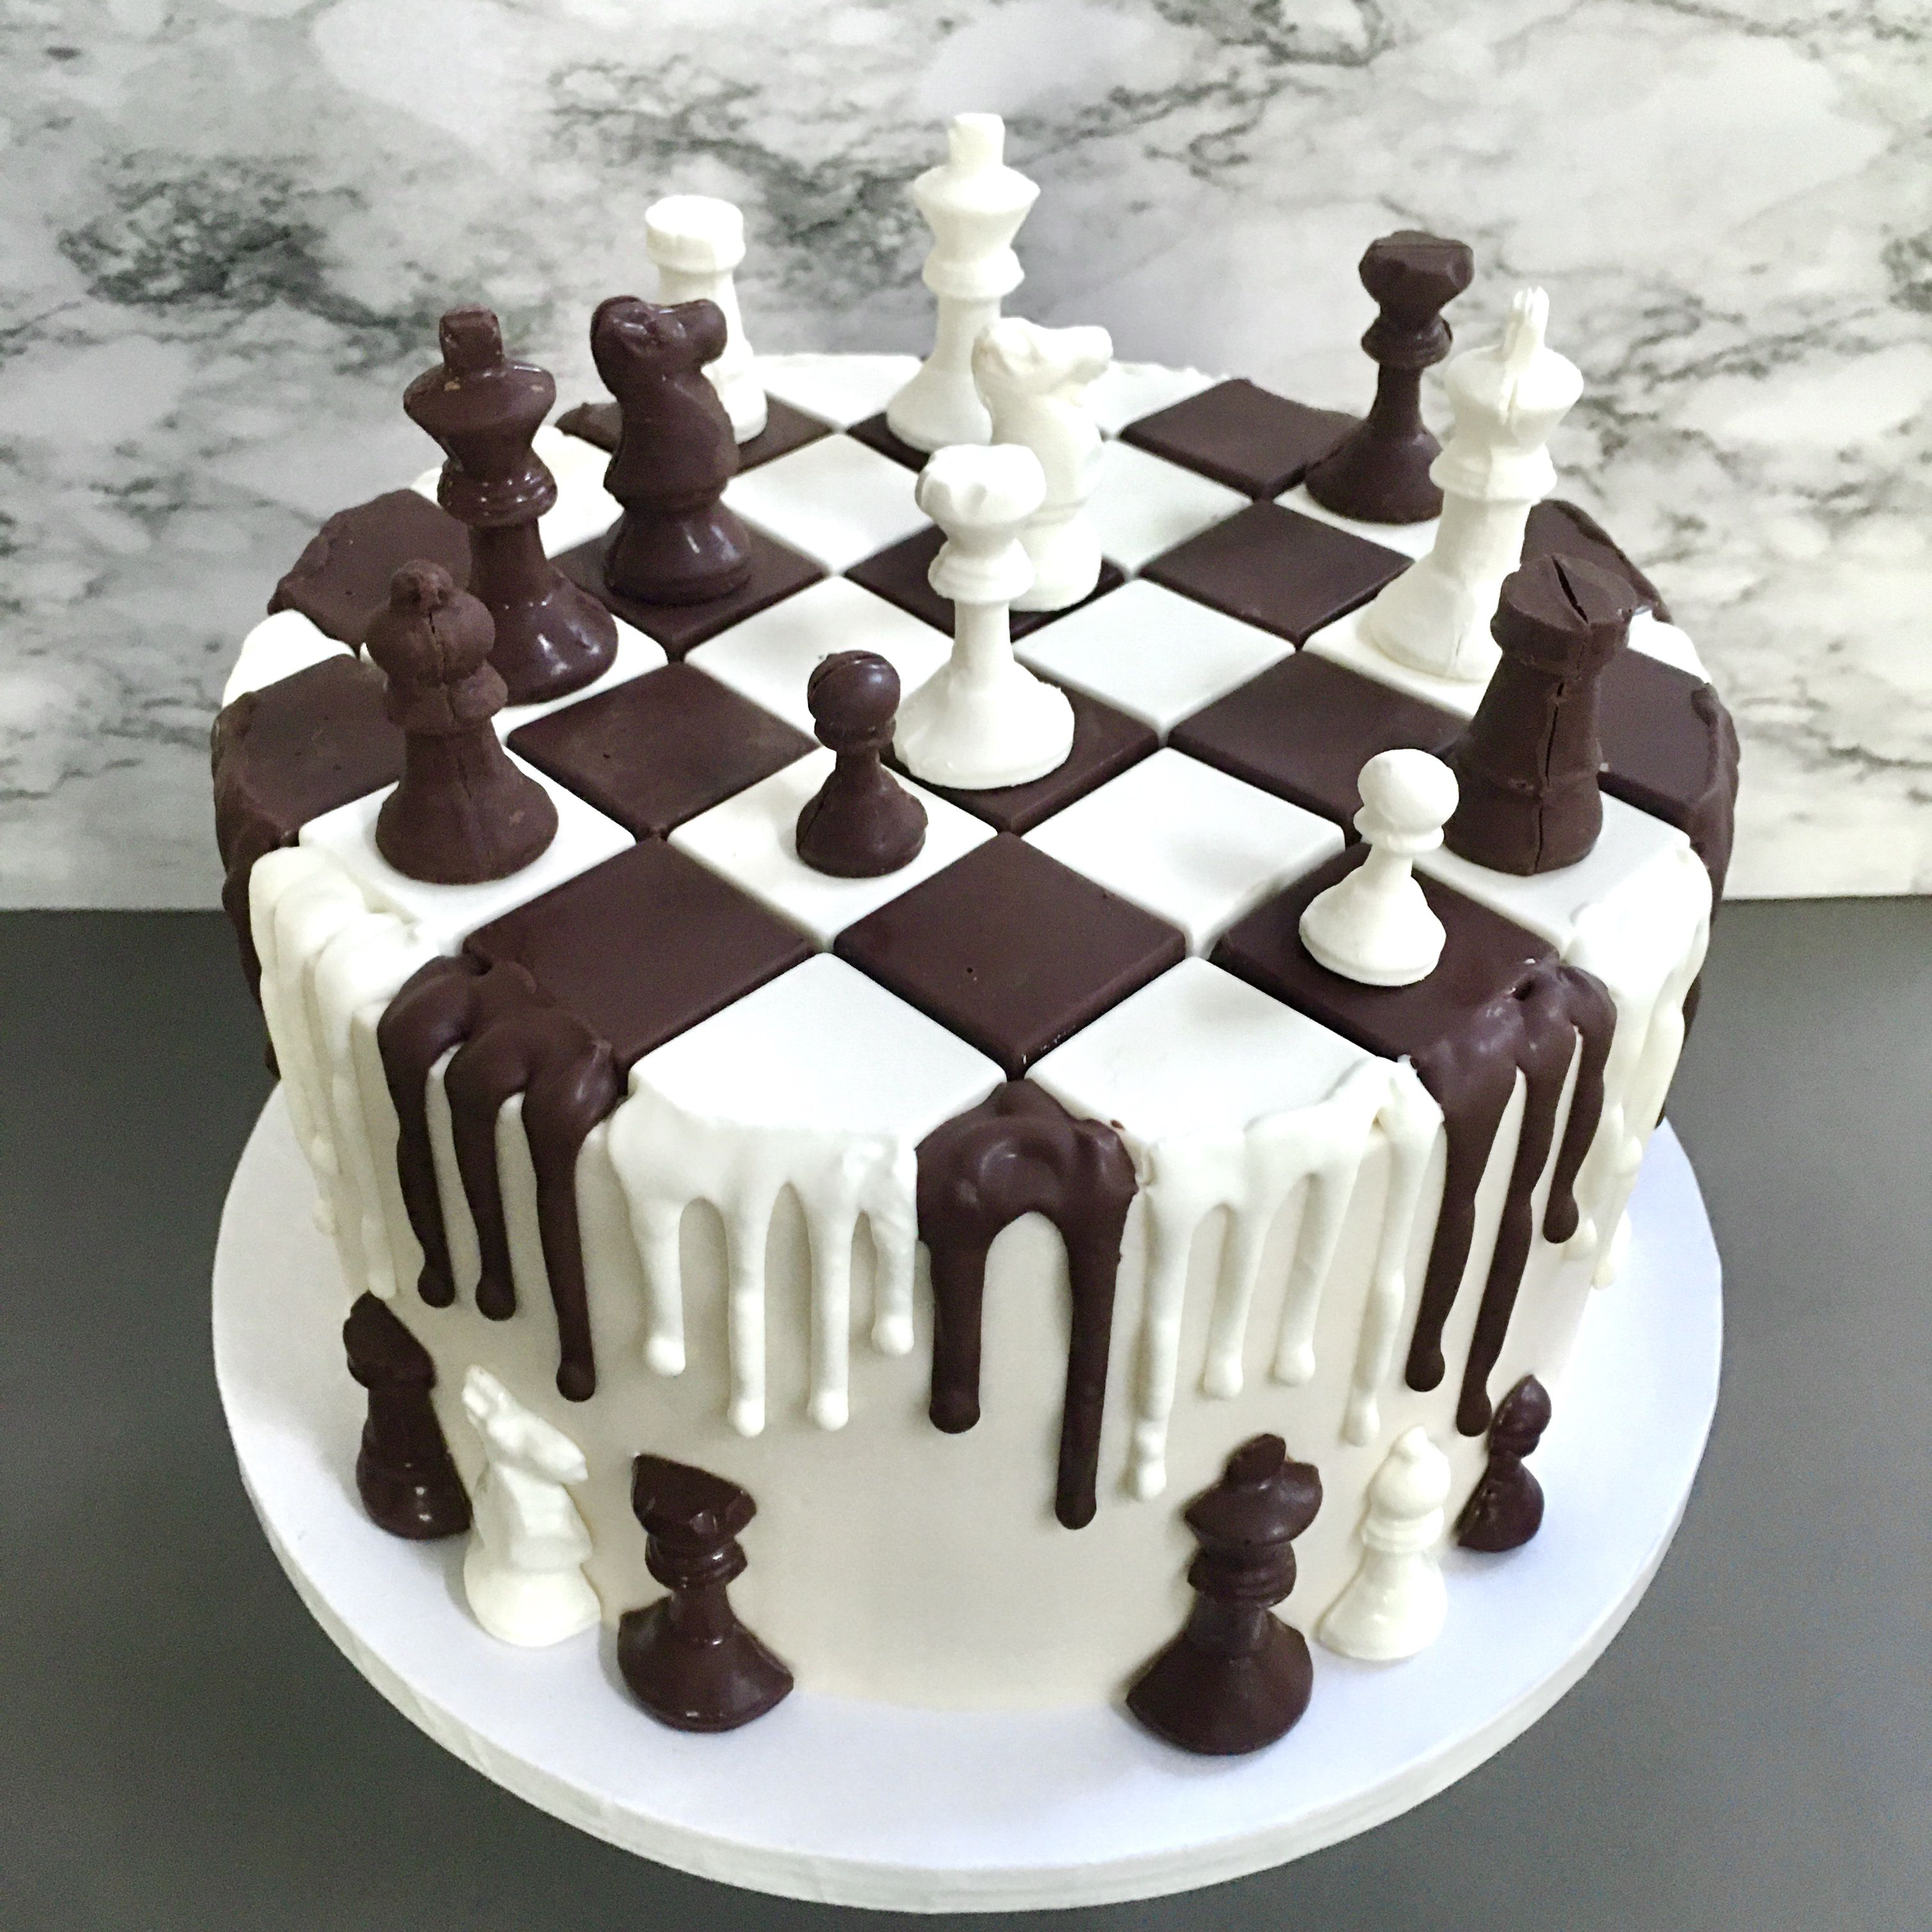 Torte u slici 89b87664f6b08c2e577645861d1aec2b